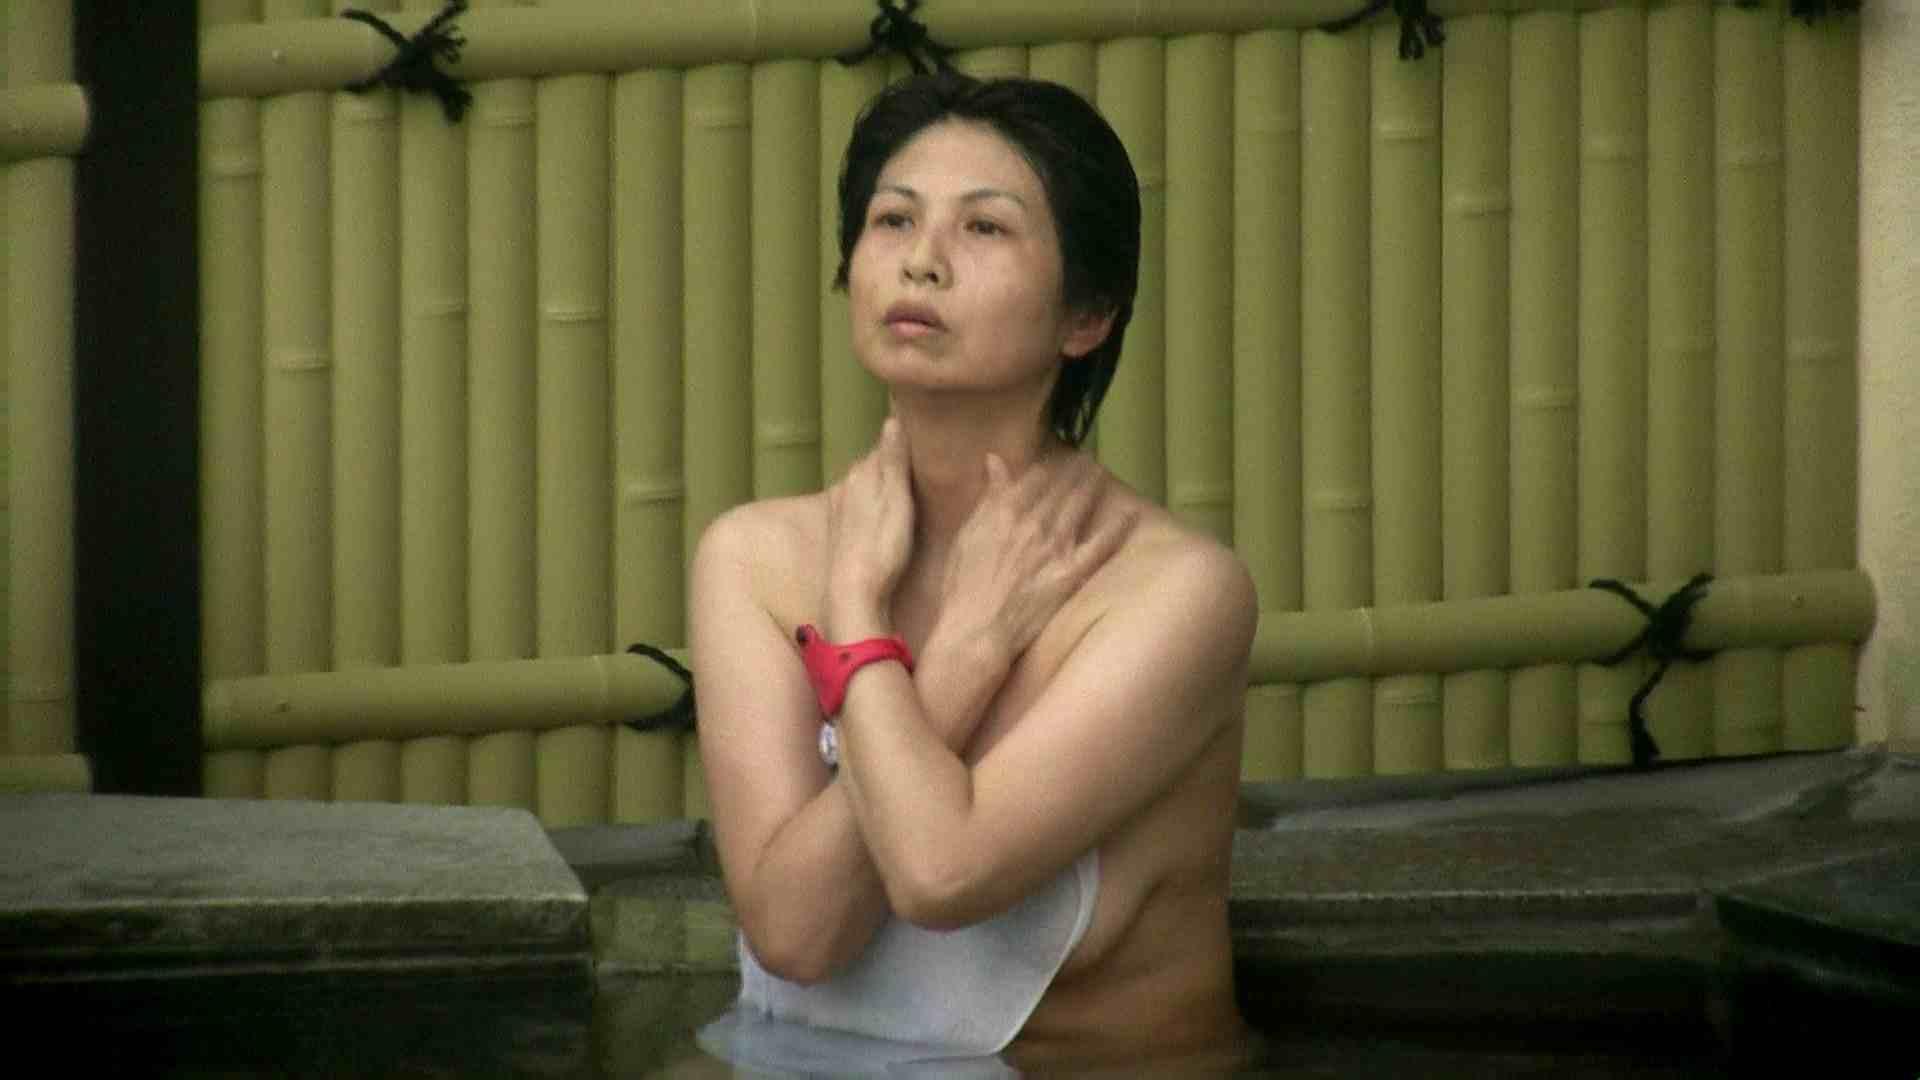 Aquaな露天風呂Vol.636 HなOL | 盗撮  82pic 40